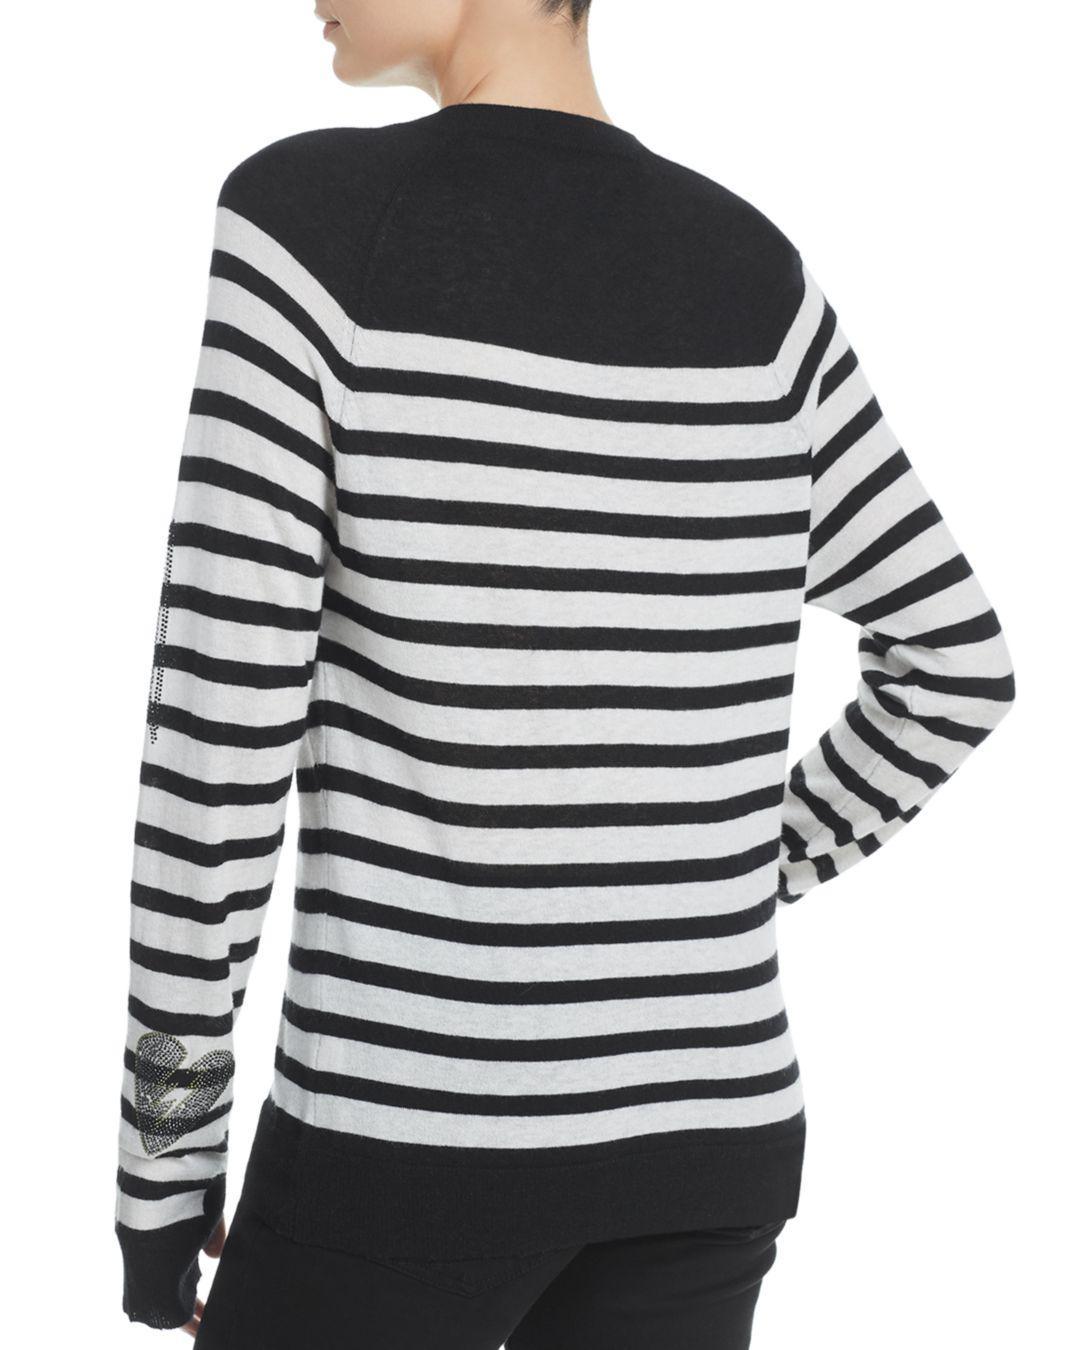 870a6f4c8bd021 Zadig & Voltaire Reglis Bis Striped Cashmere Sweater in Black - Save 3% -  Lyst